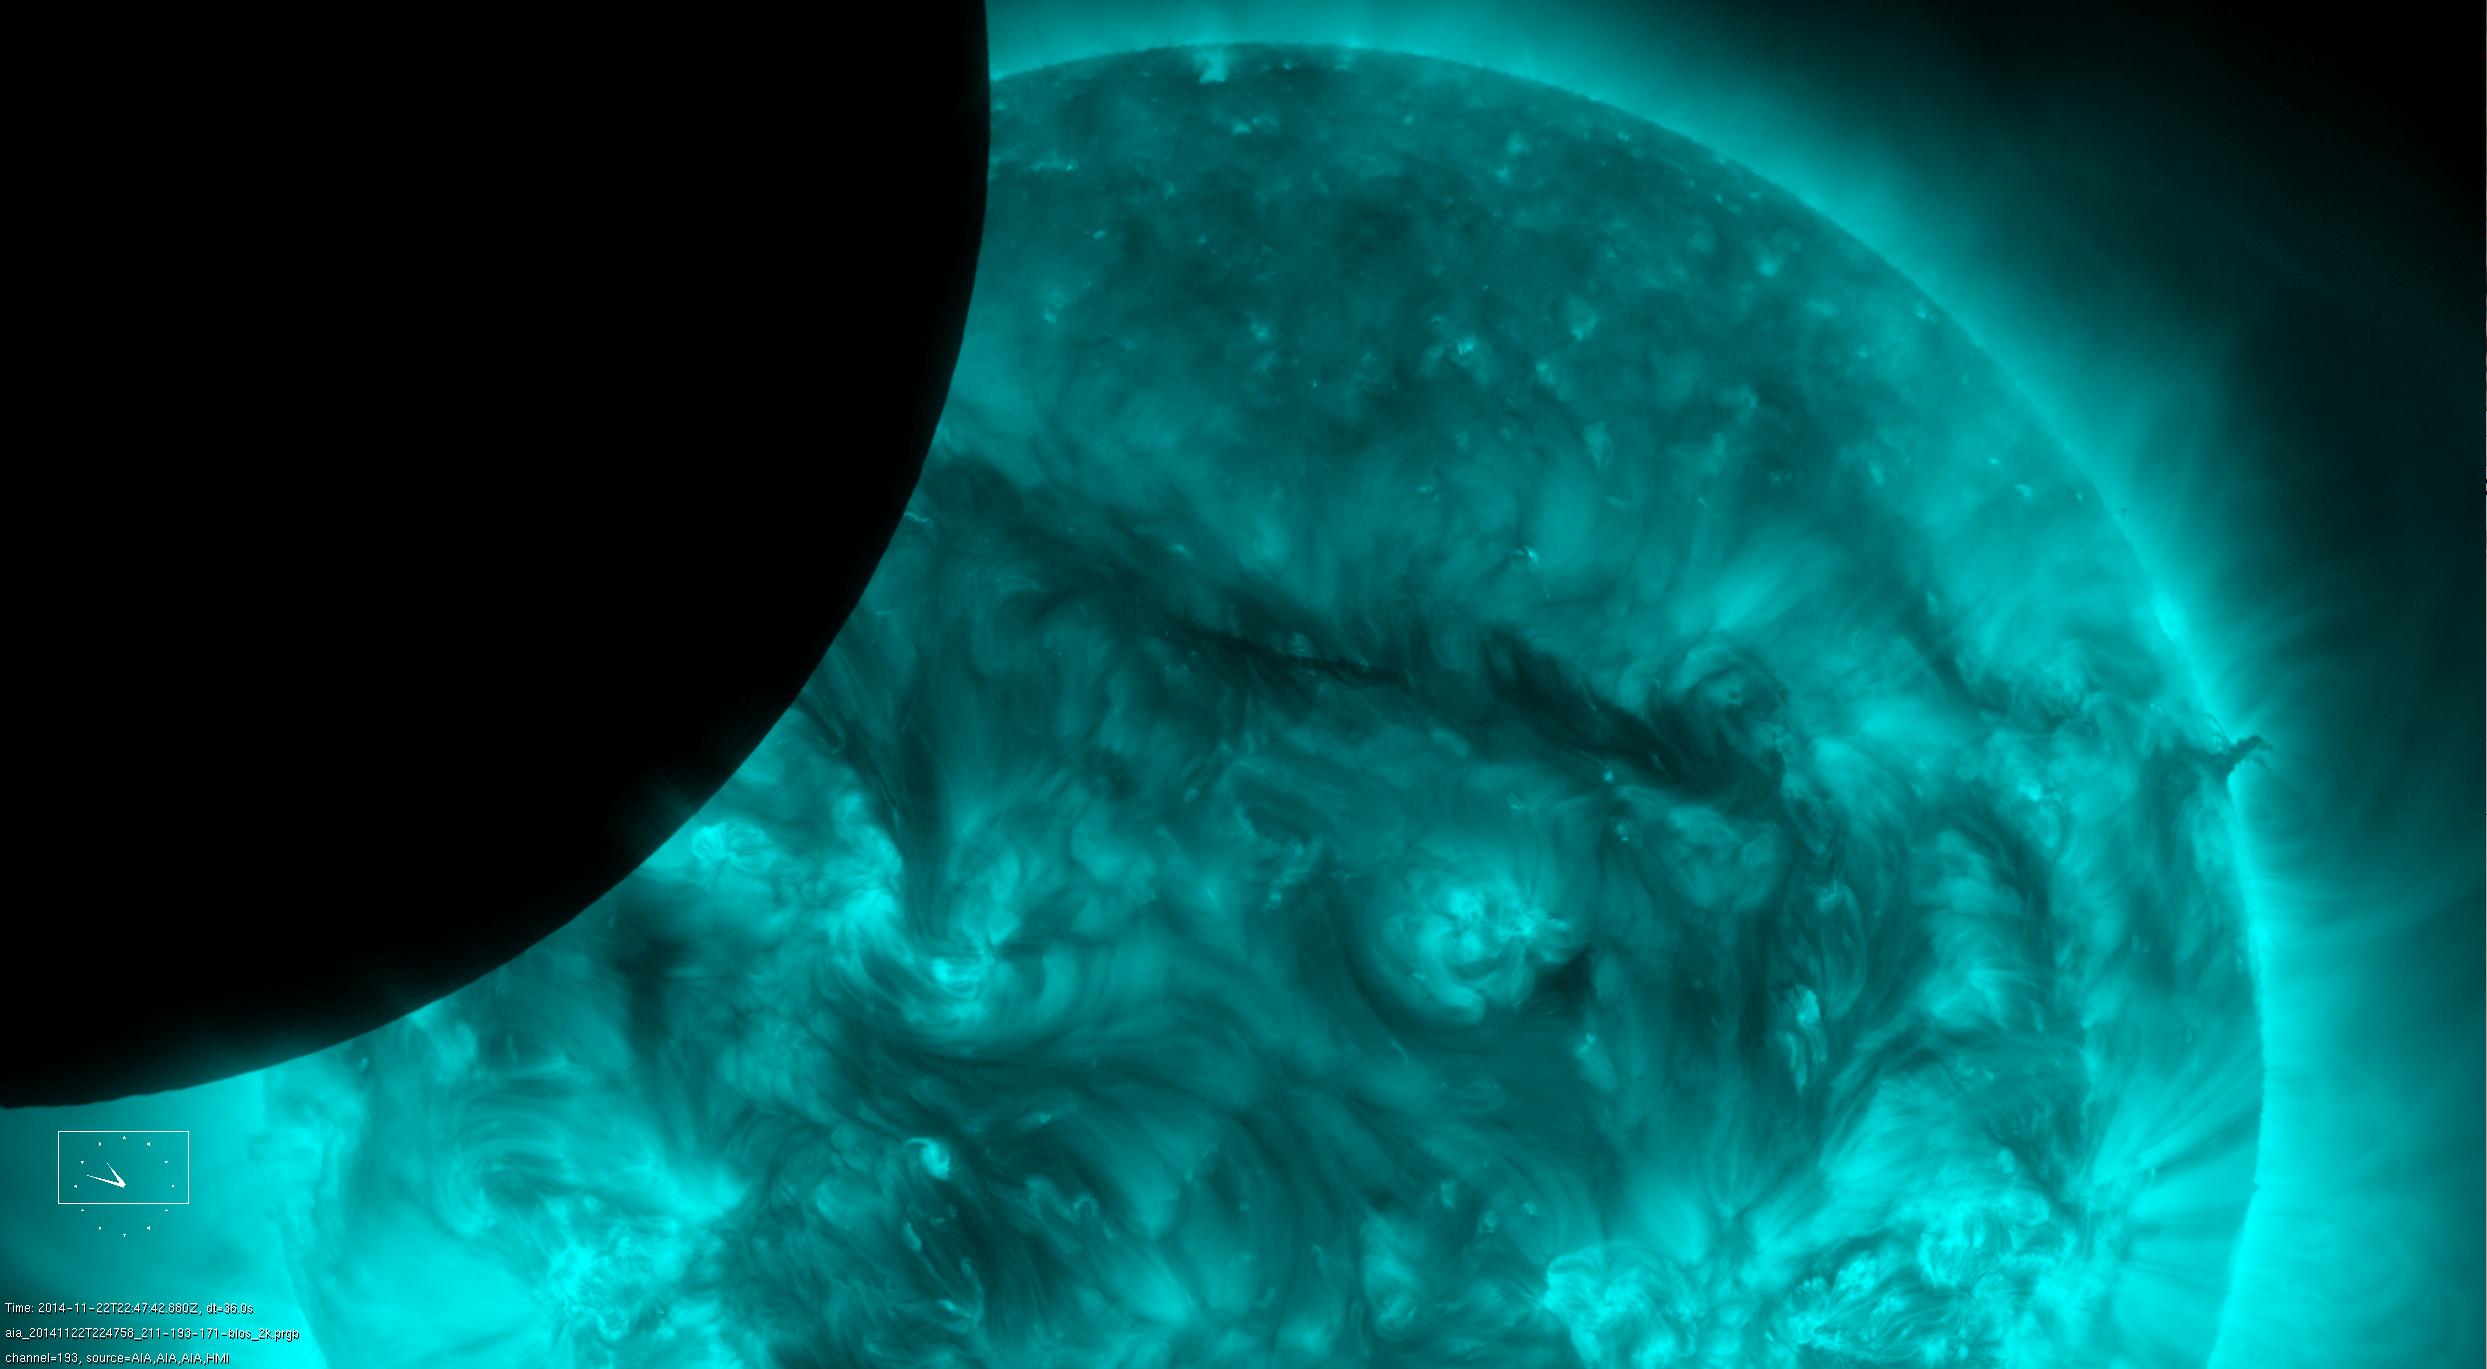 Colouring sheets of the lunar eclipse - A Partial Lunar Eclipse As Seen By Sdo